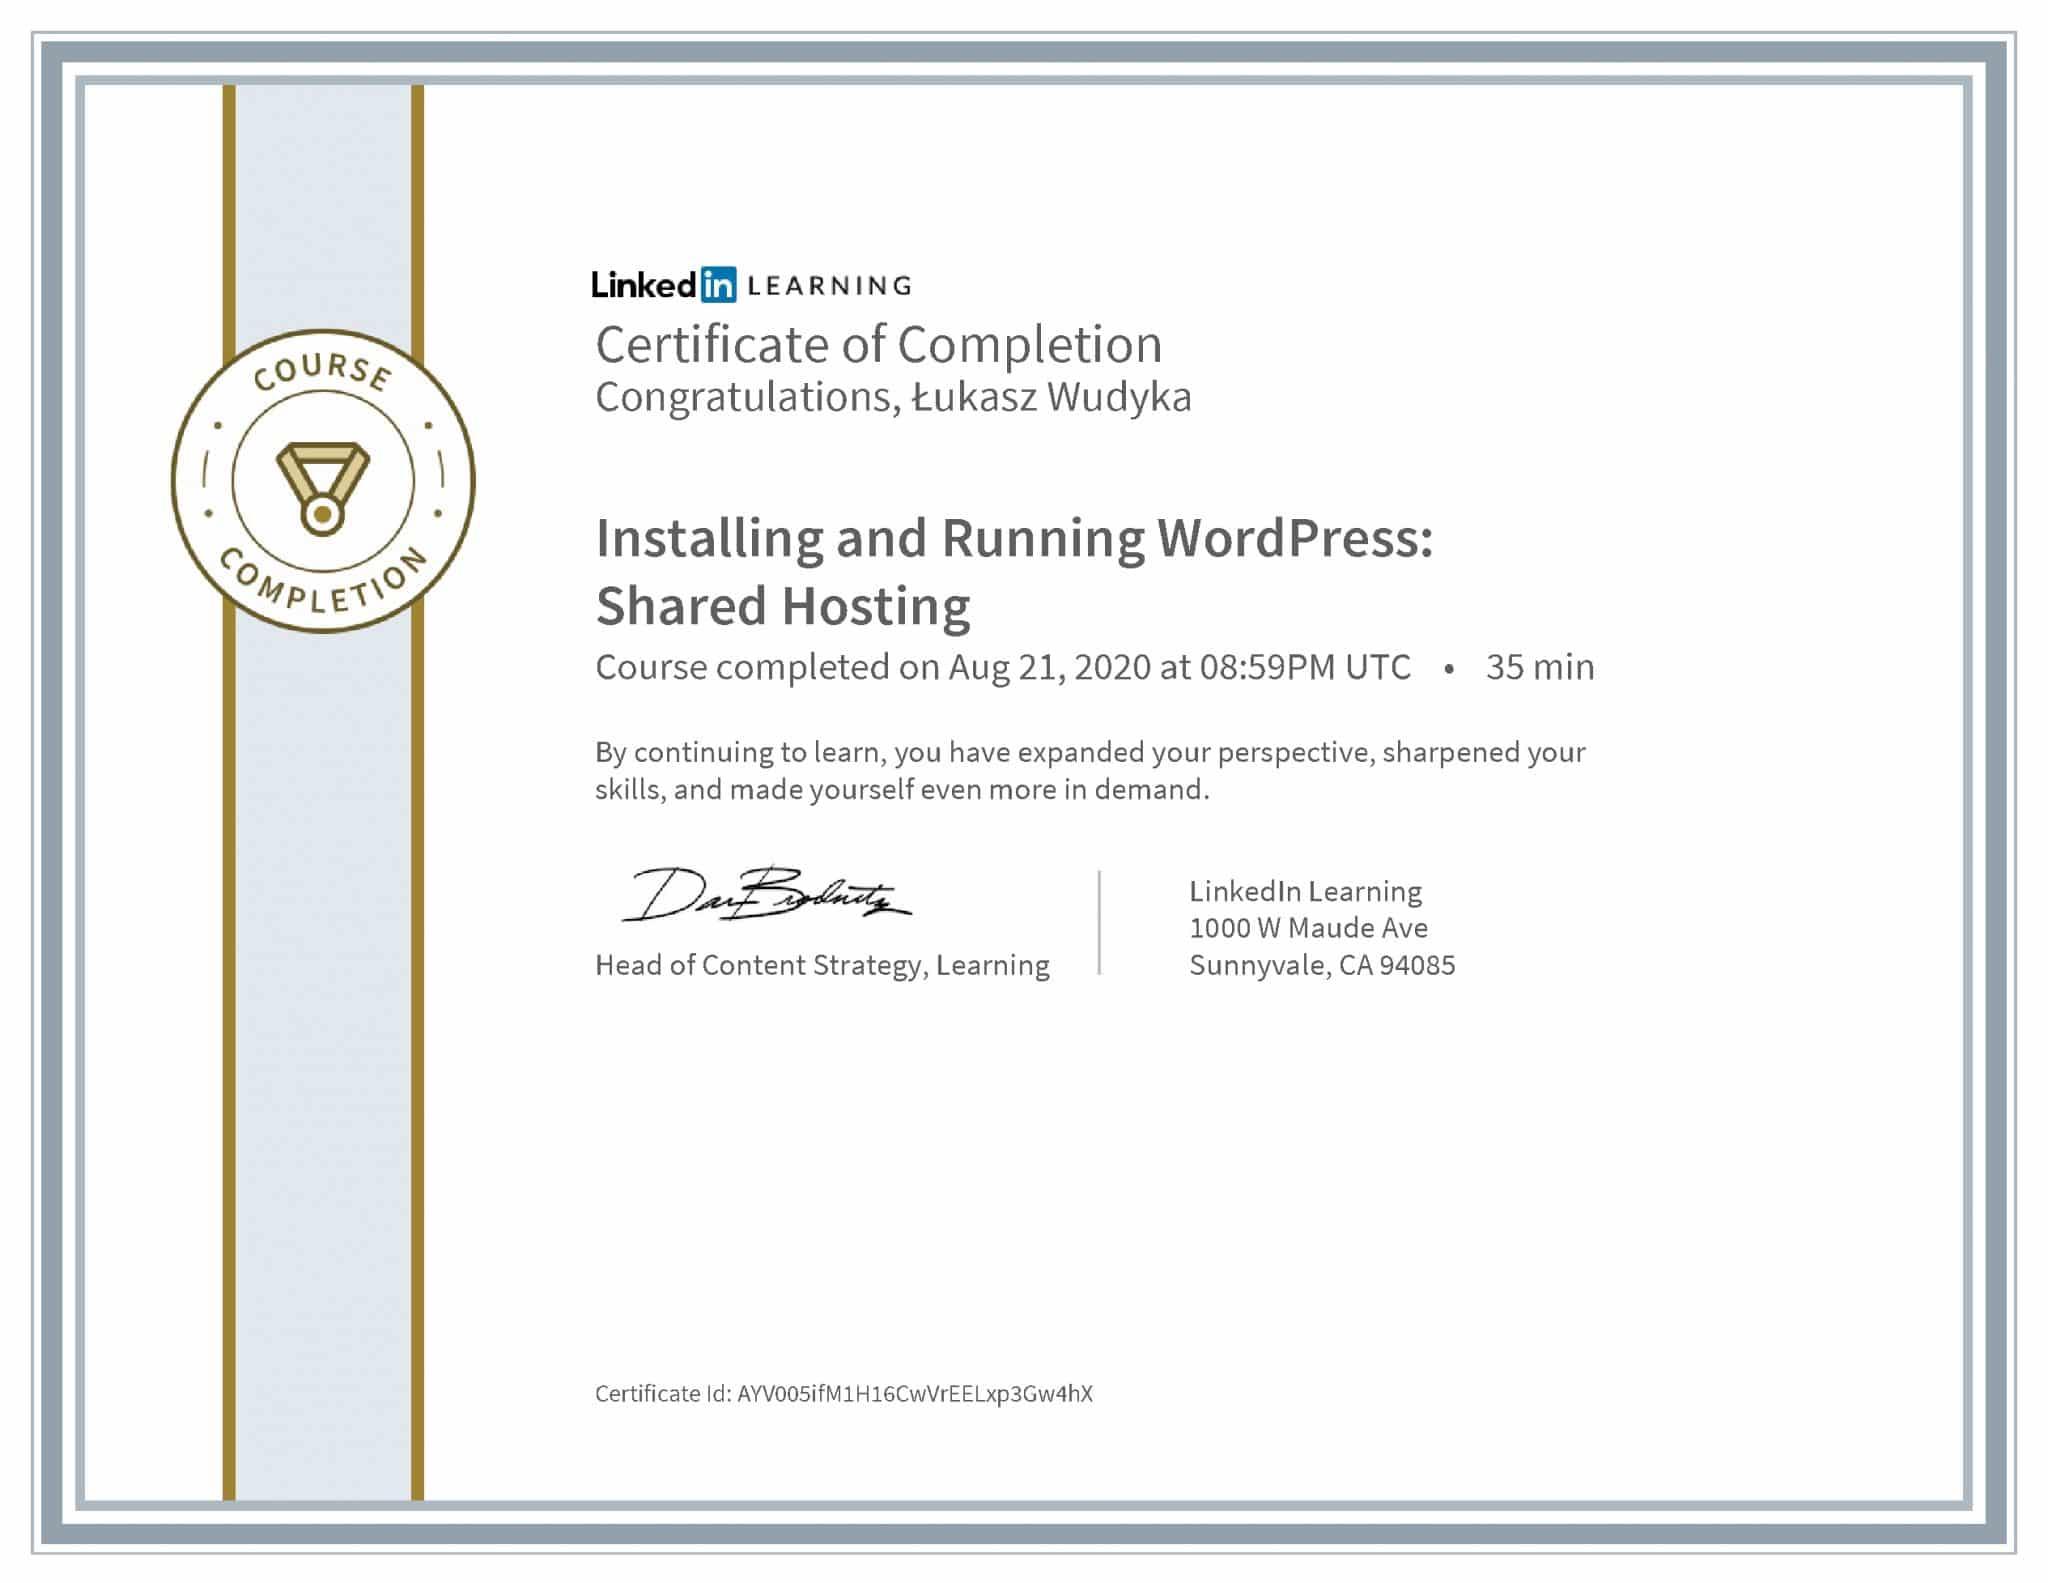 Łukasz Wudyka certyfikat LinkedIn Installing and Running WordPress: Shared Hosting